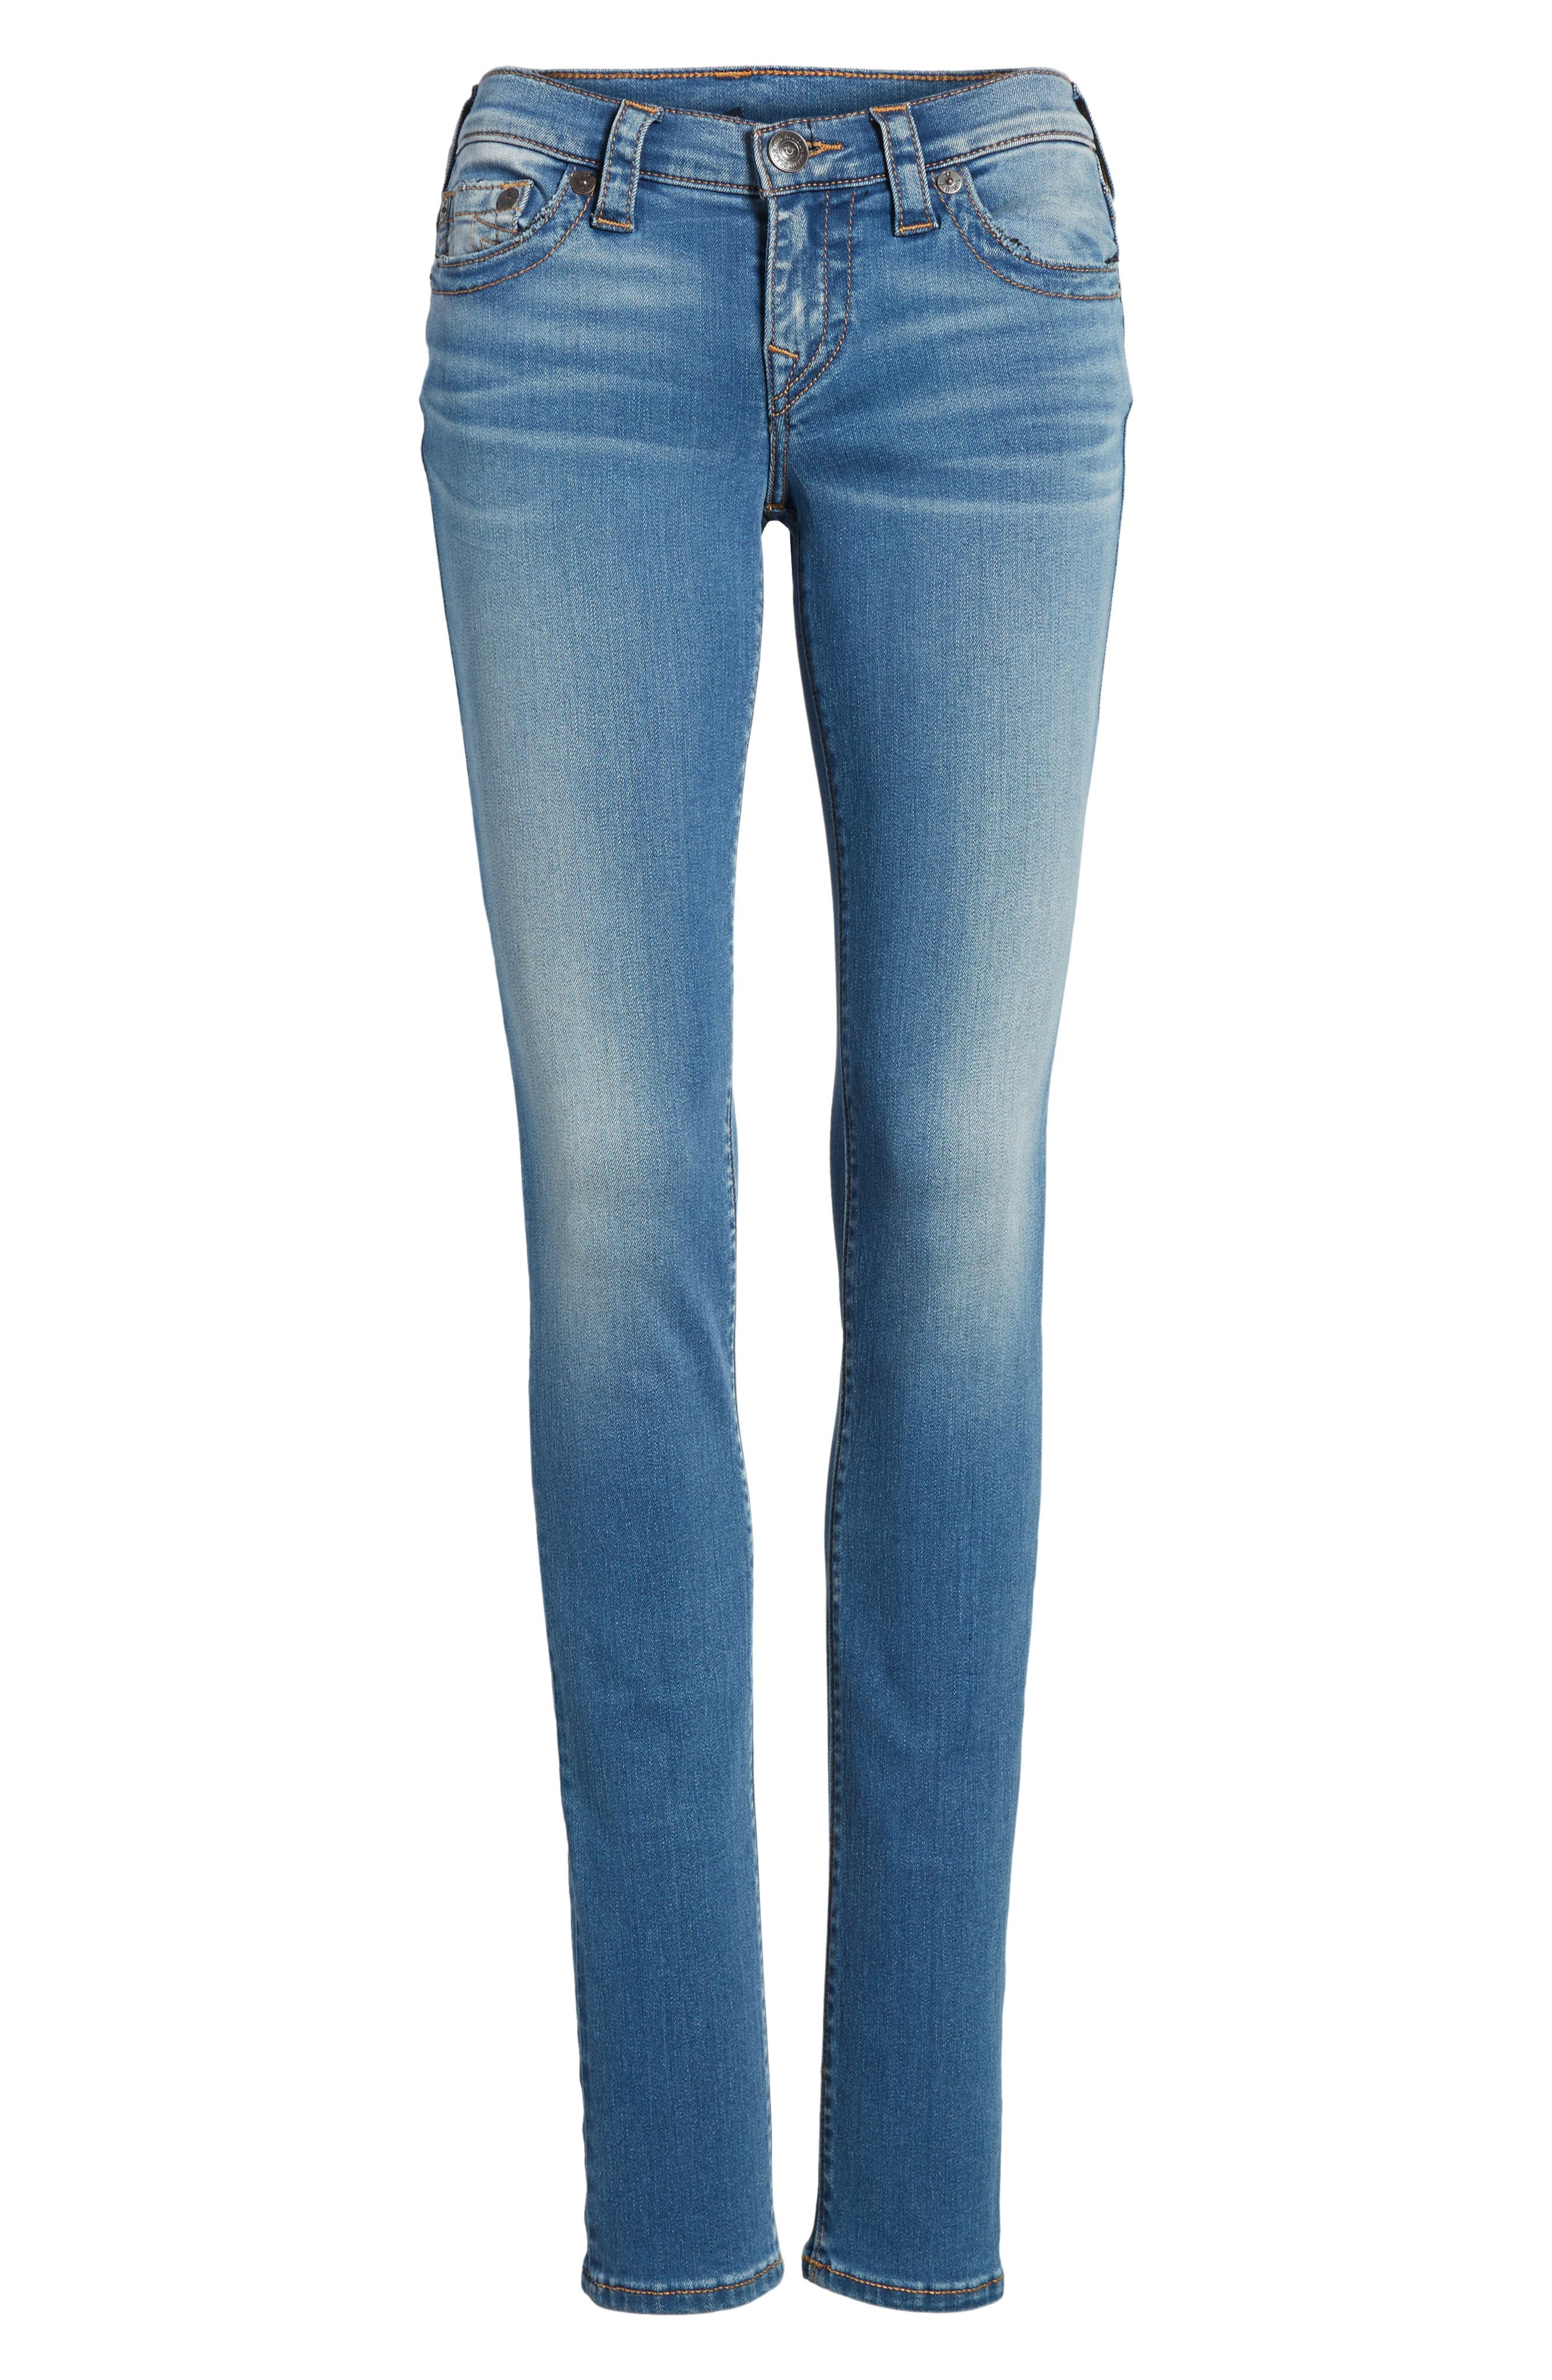 Stella Low Rise Skinny Jeans,                             Alternate thumbnail 6, color,                             400